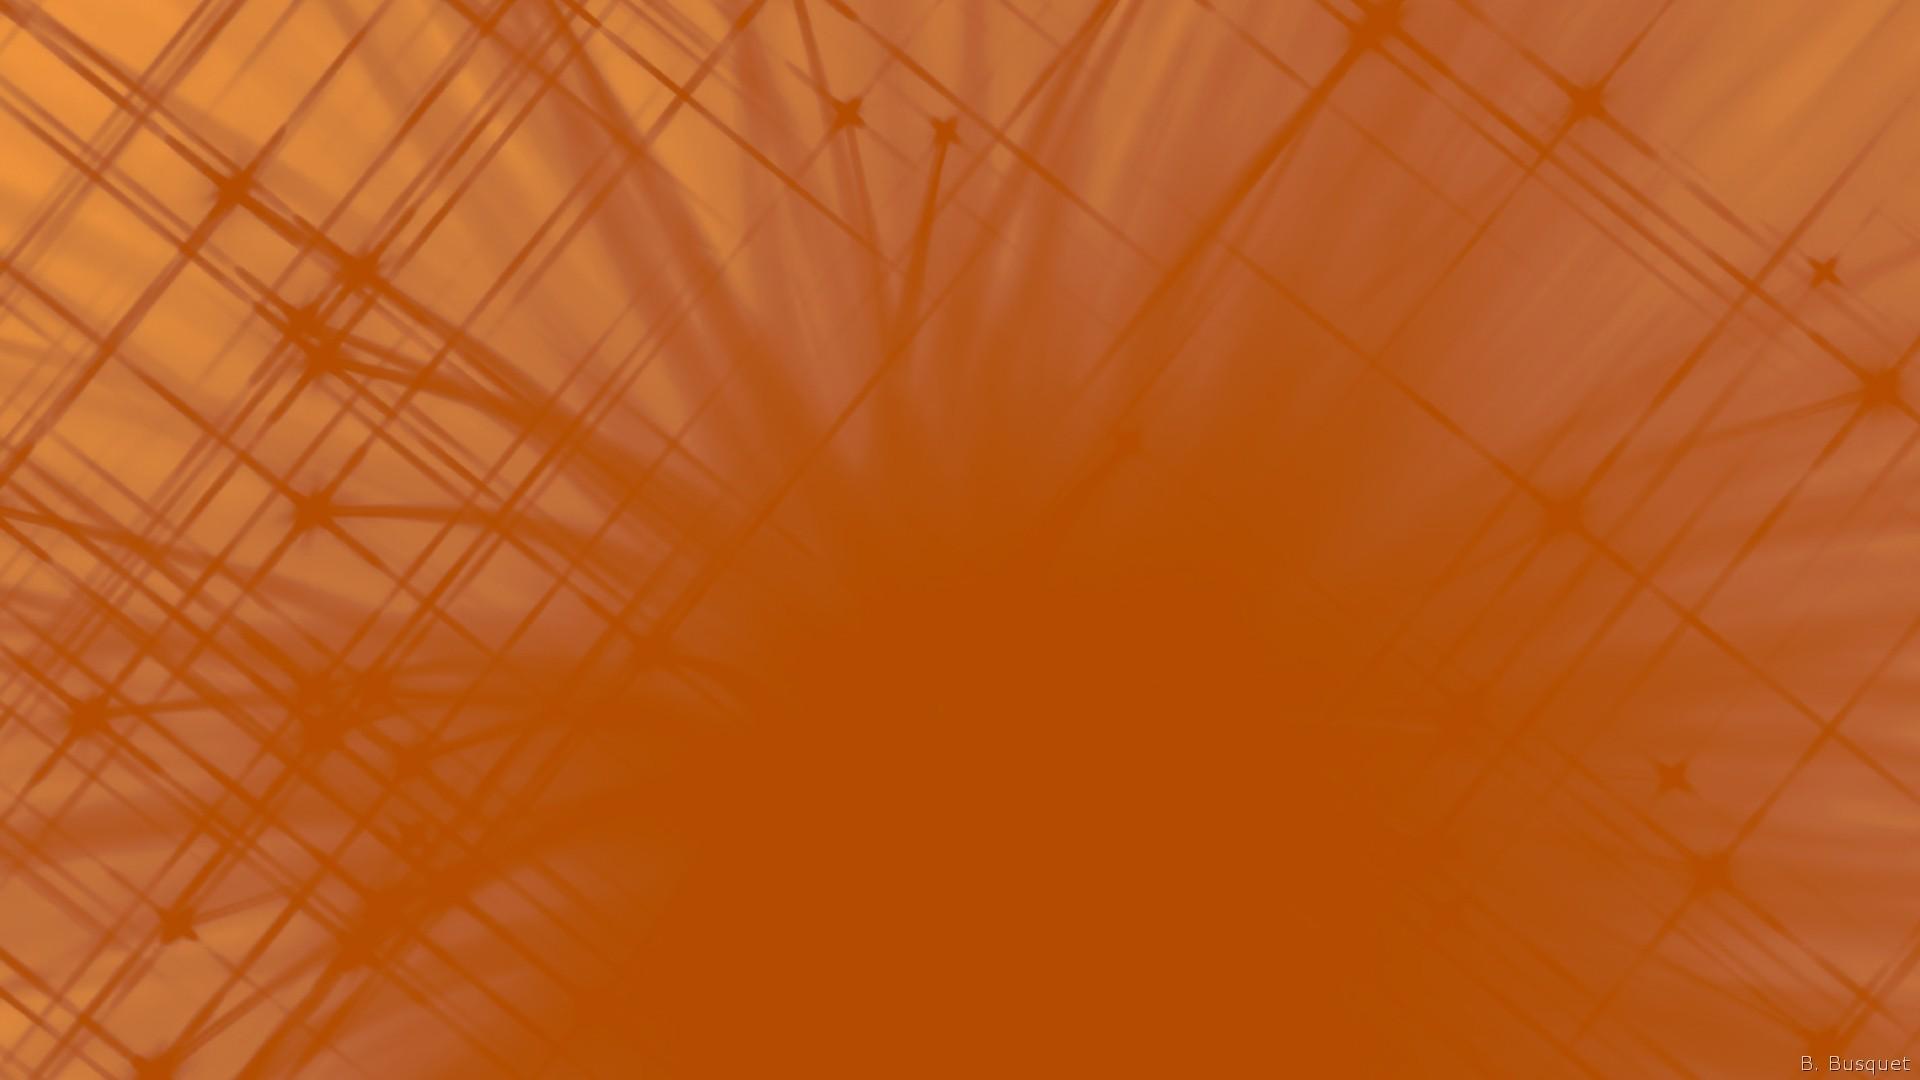 Orange Wallpapers on Green Spiral Paper